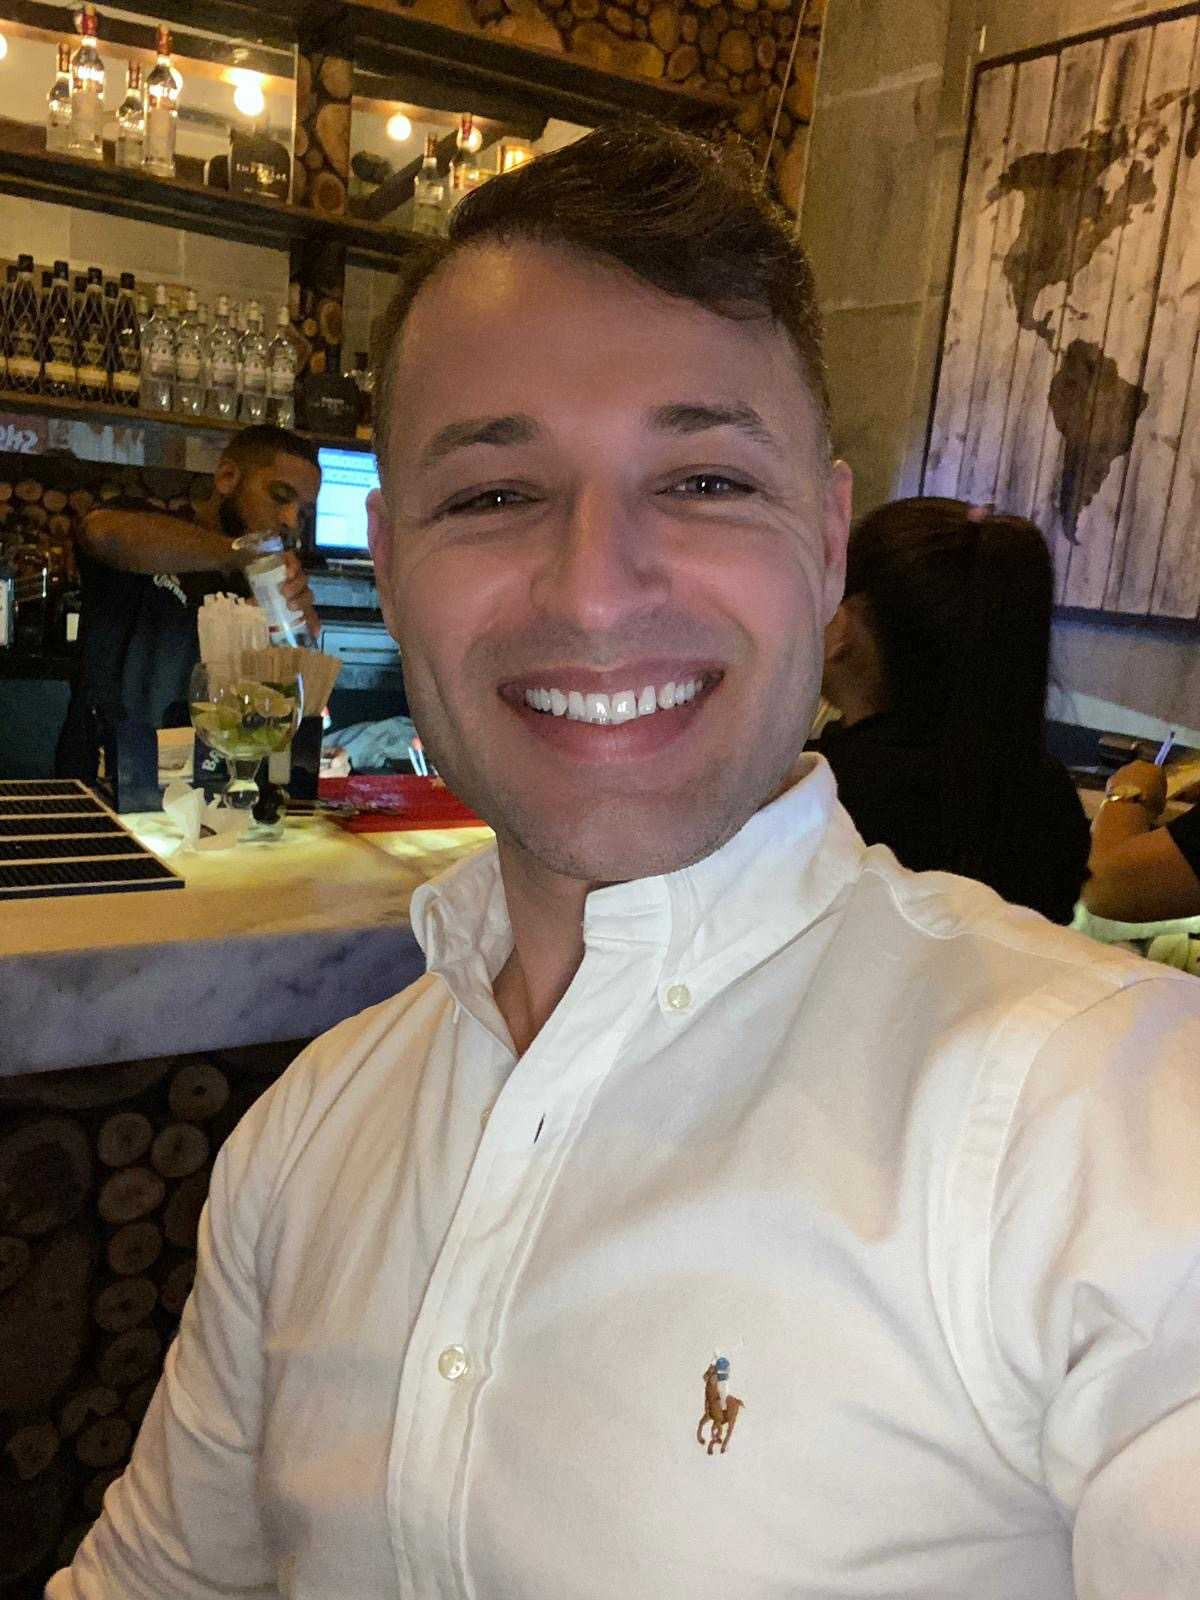 Diar Haciy, 34, bjöd vårdpersonalen på Lunds sjukhus på lunch.